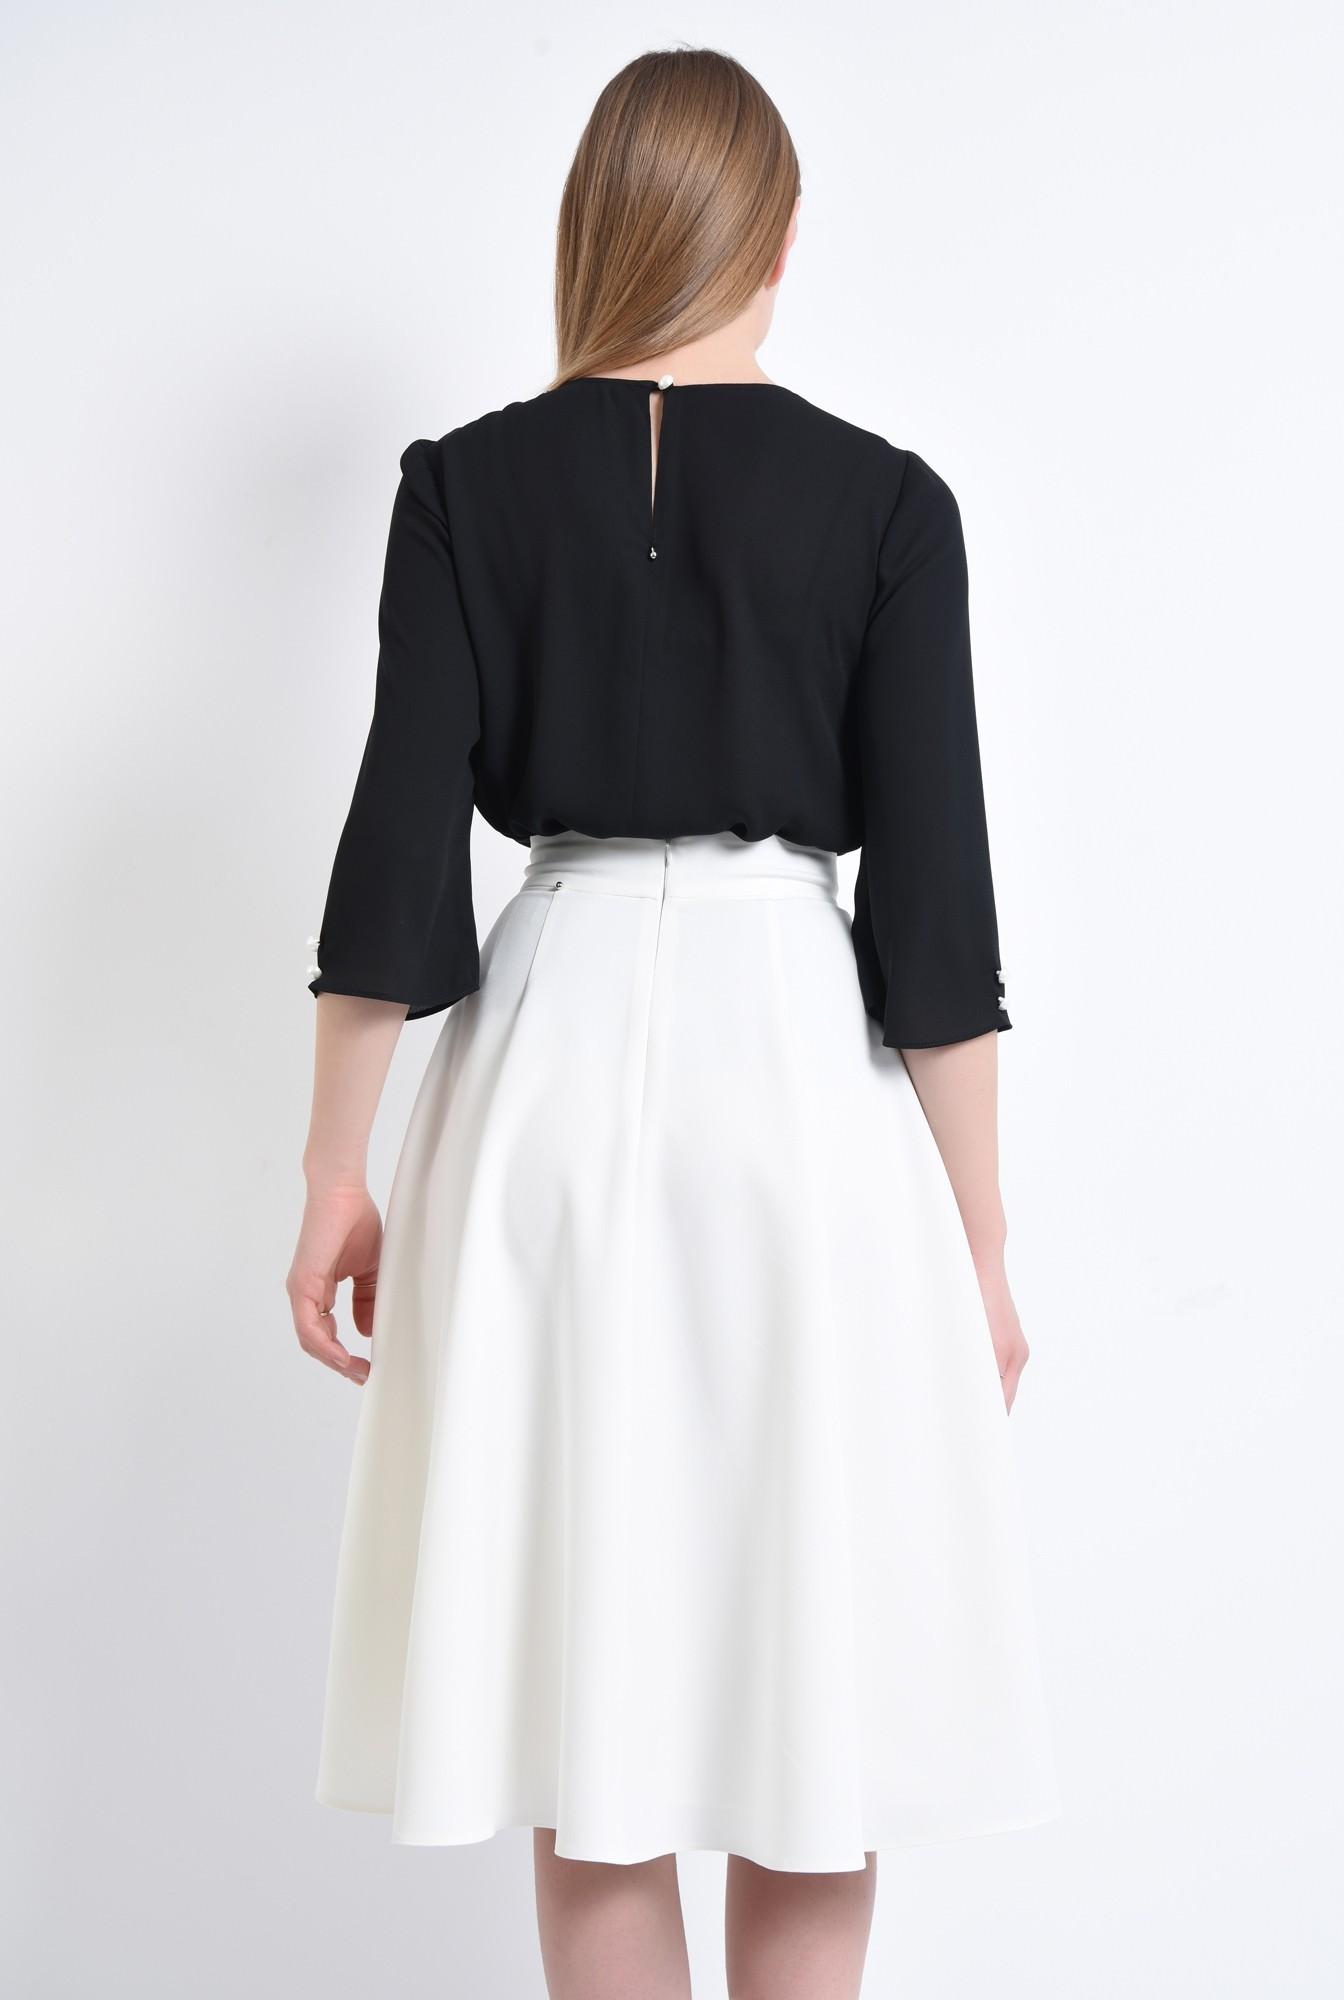 1 - Fusta eleganta, funda, contrast alb-negru